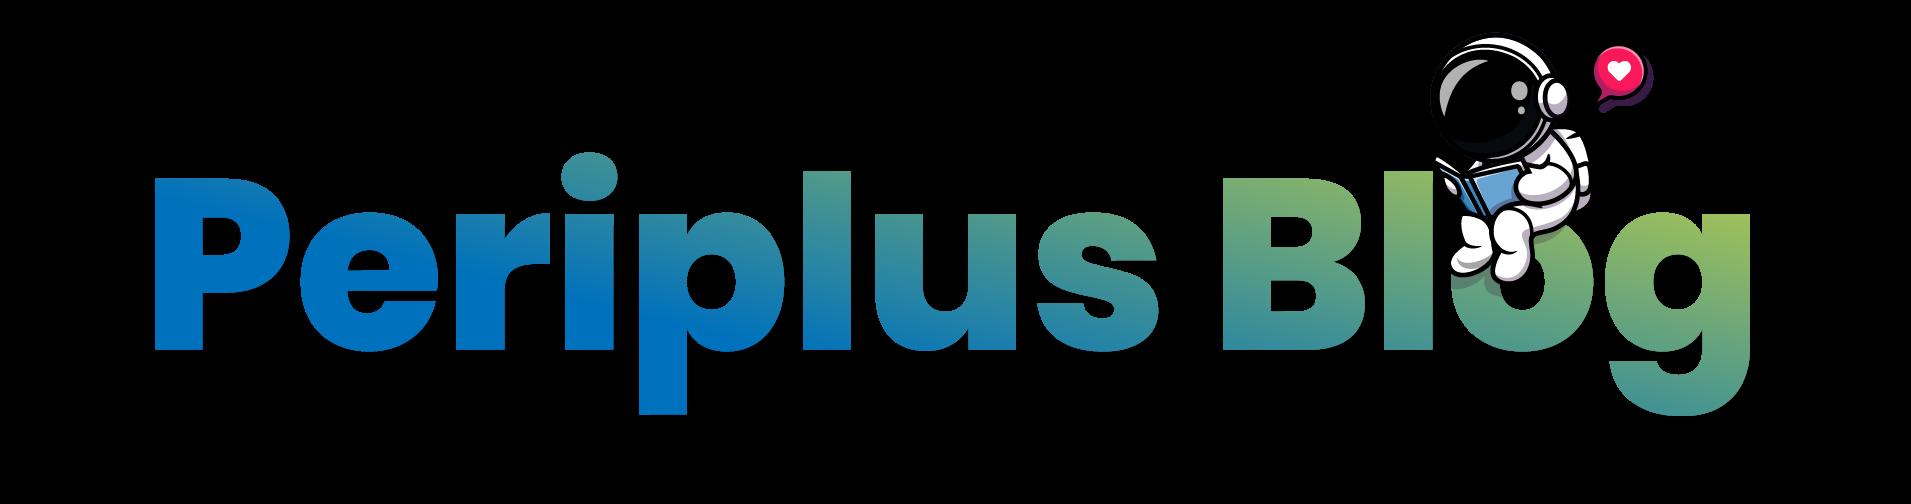 Blog Periplus.com